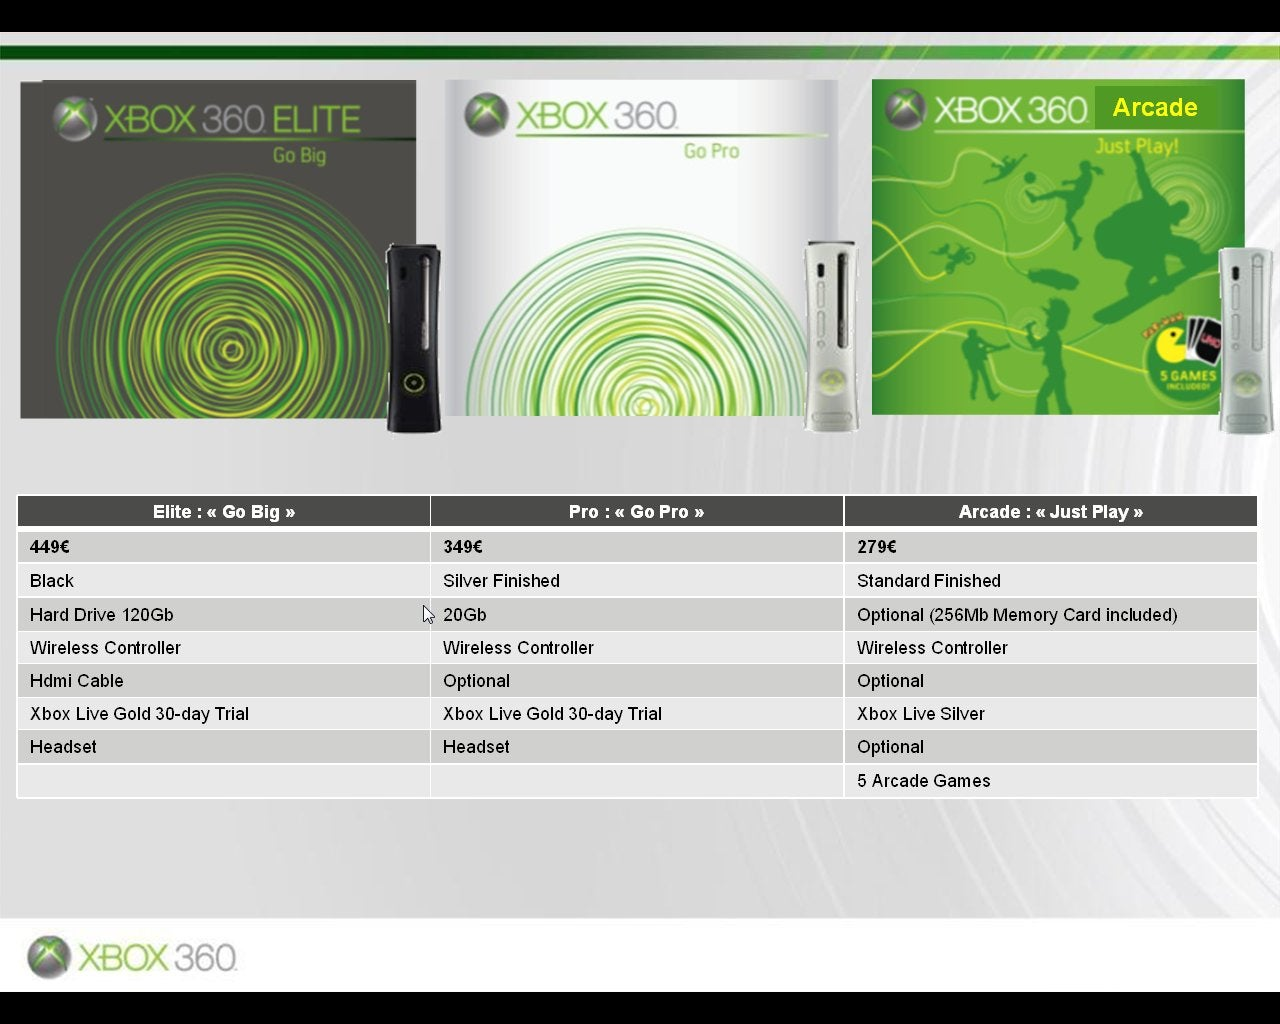 Xbox 360 Core to Become Xbox 360 Arcade?